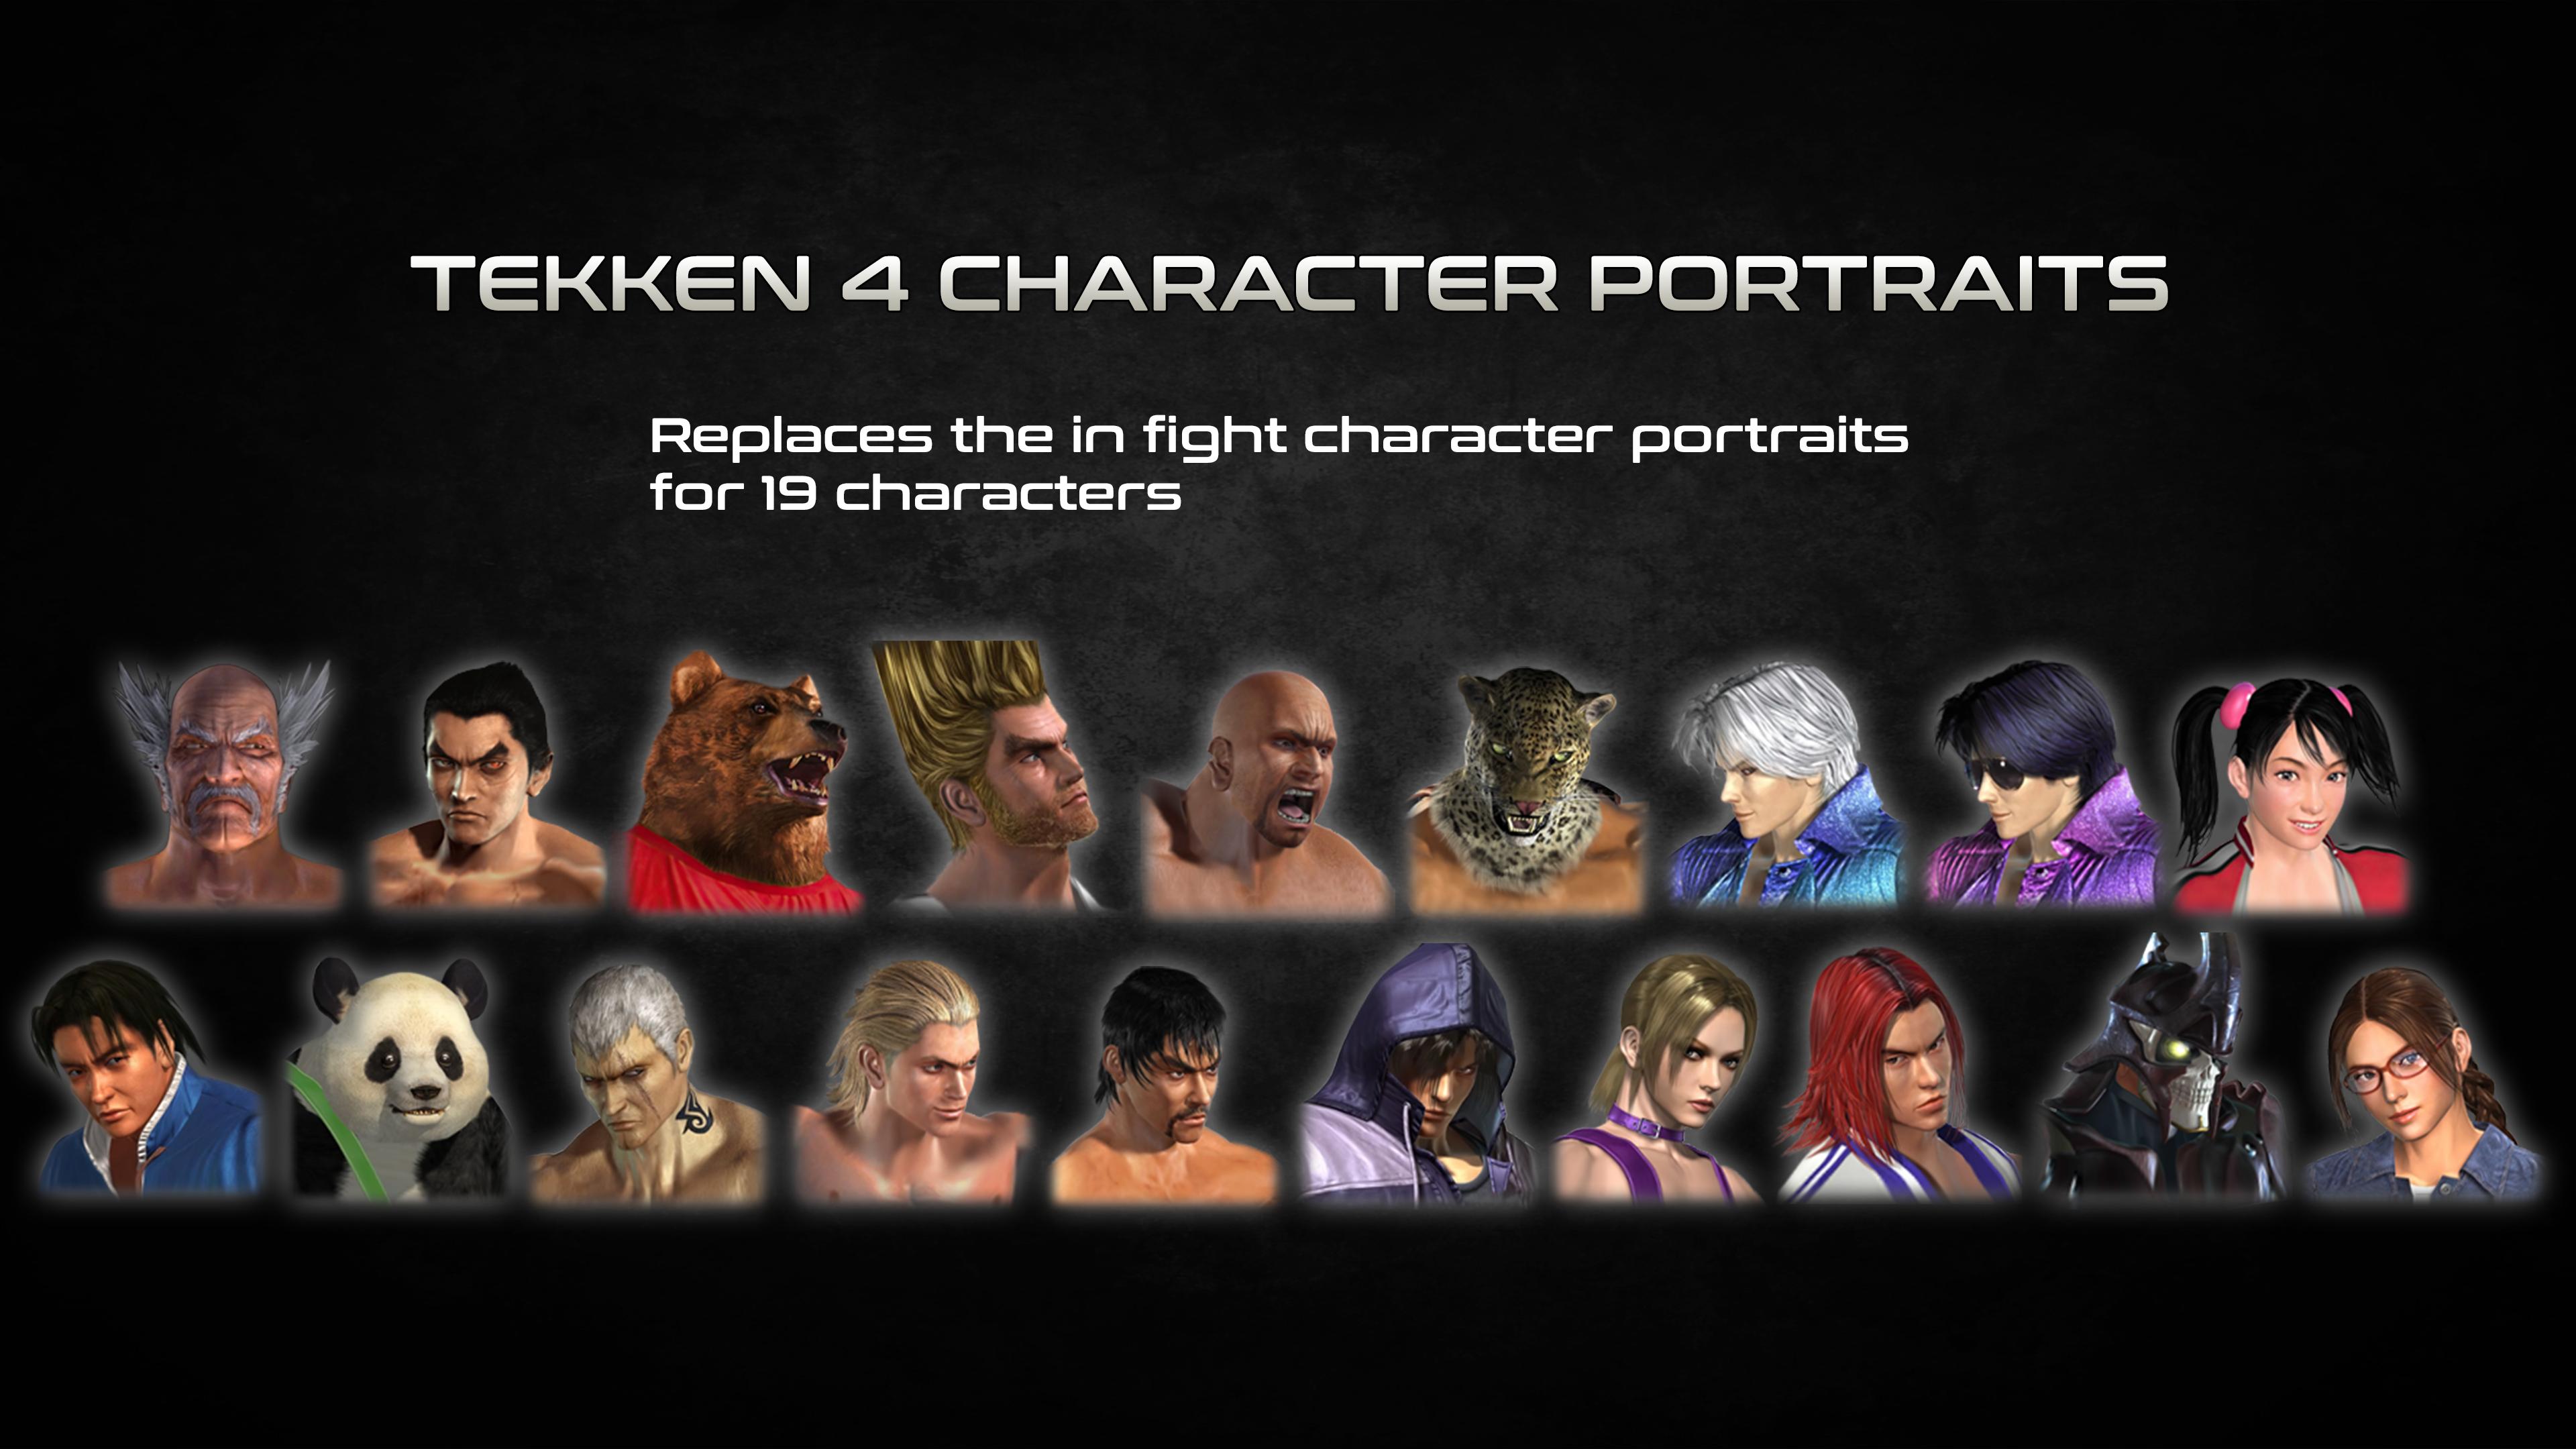 Tekken 4 Character Portraits By Thei3arracuda On Deviantart